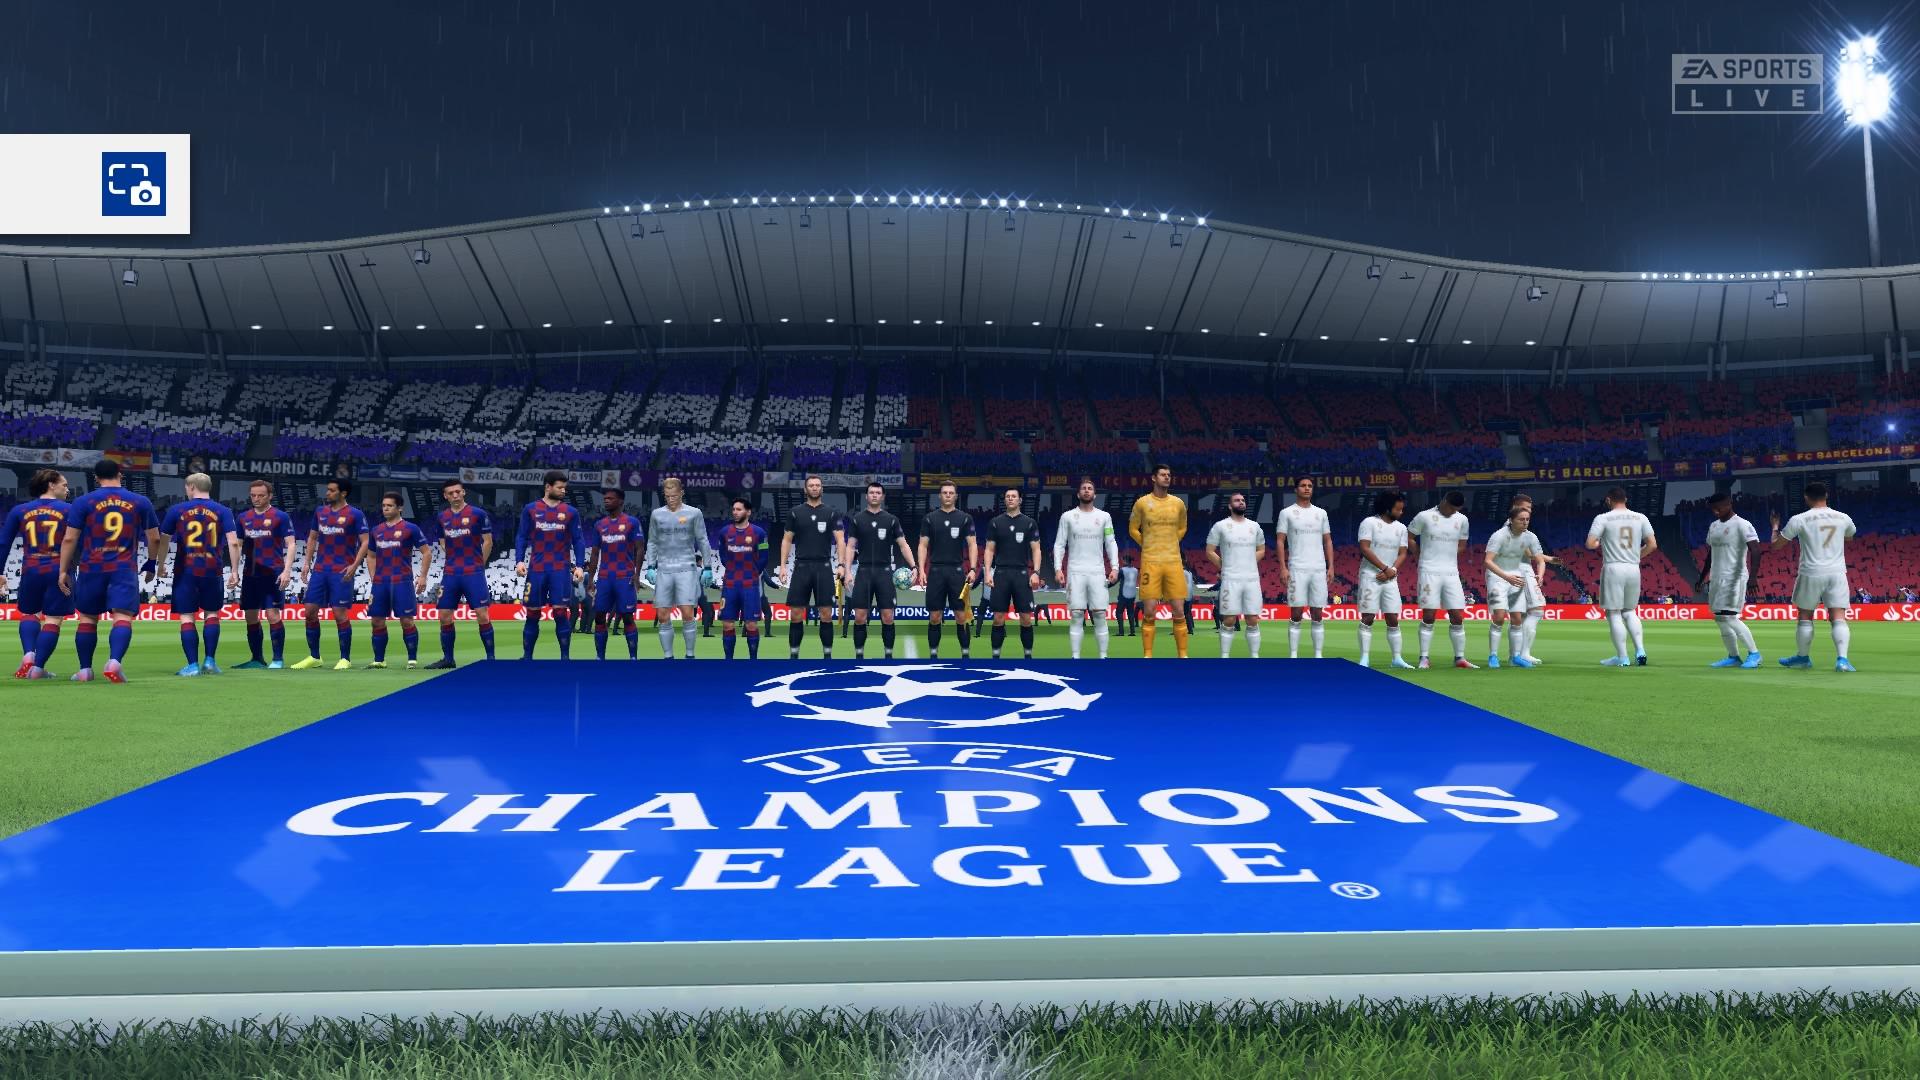 10 million fifa 20 players